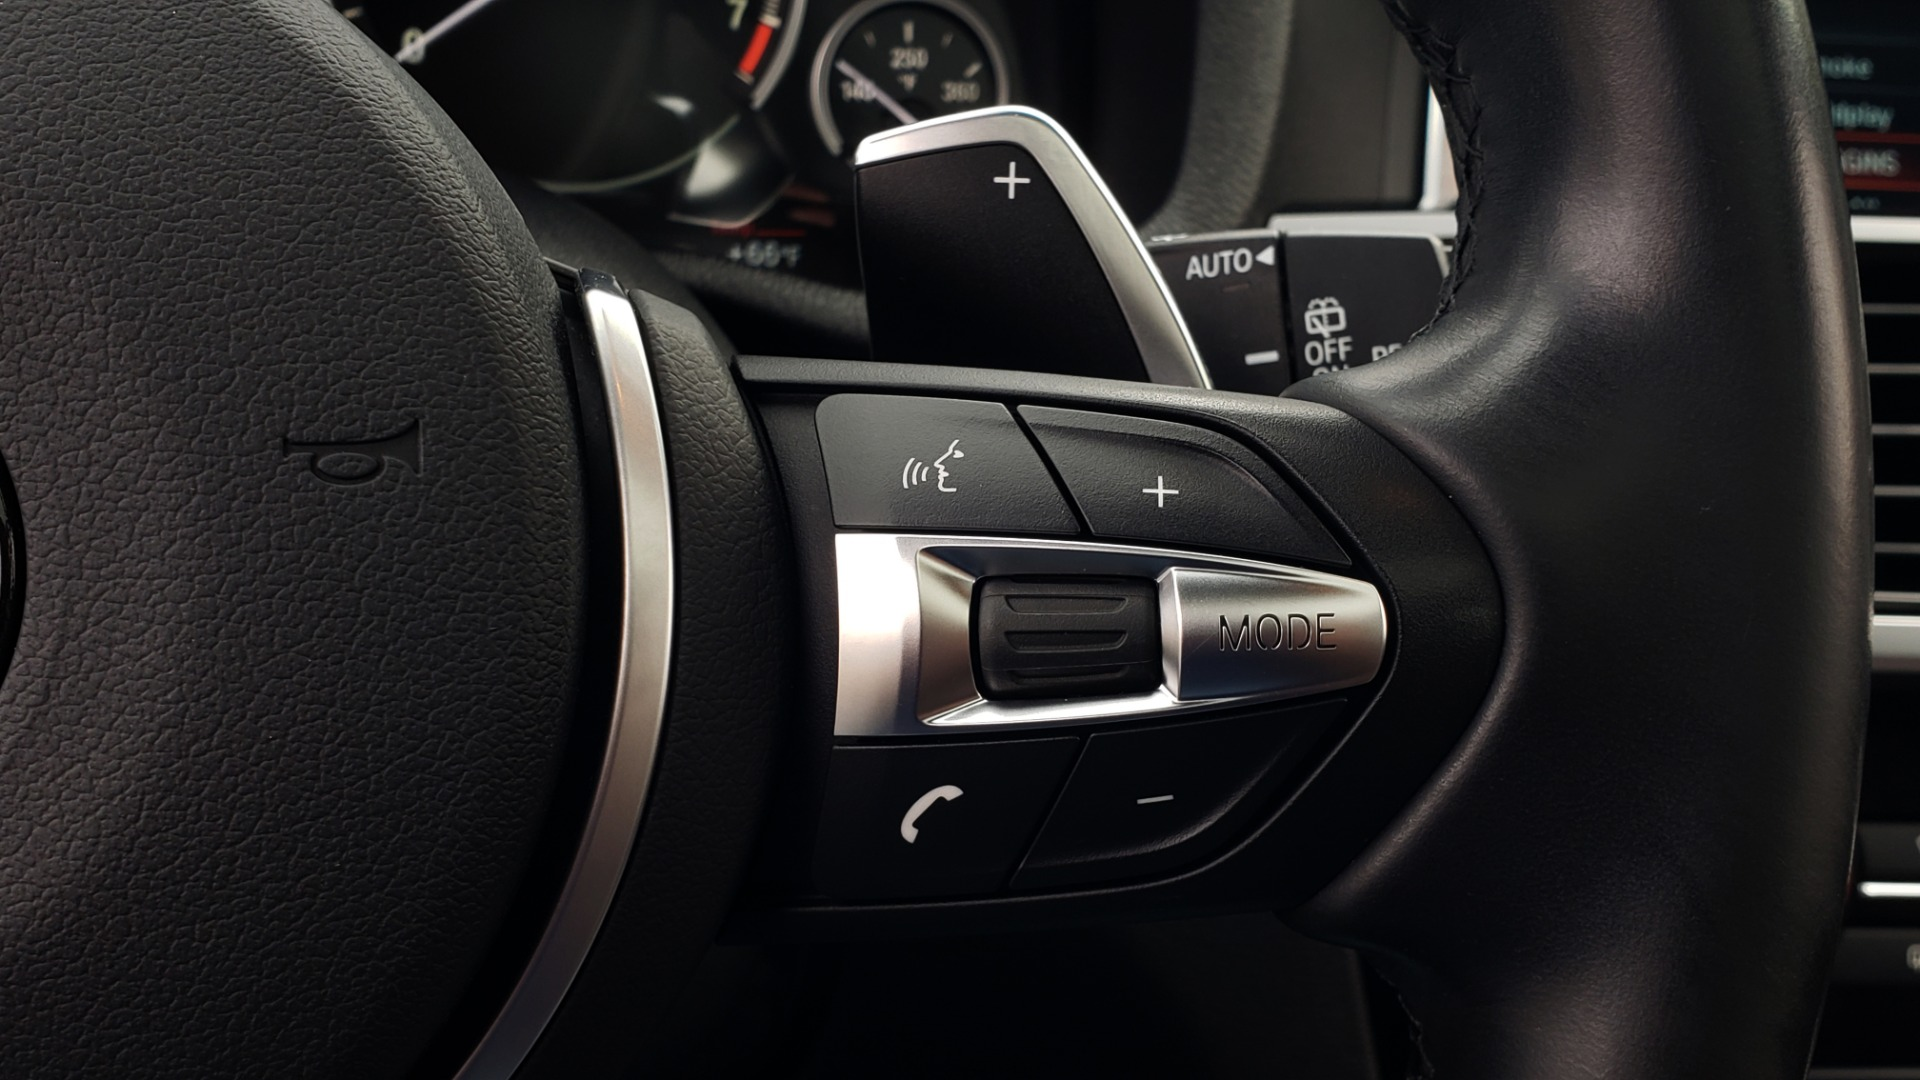 Used 2017 BMW X3 XDRIVE35I M-SPORT / DRVR ASST PLUS / TECHNOLOGY / HUD / BLIND SPOT for sale Sold at Formula Imports in Charlotte NC 28227 42